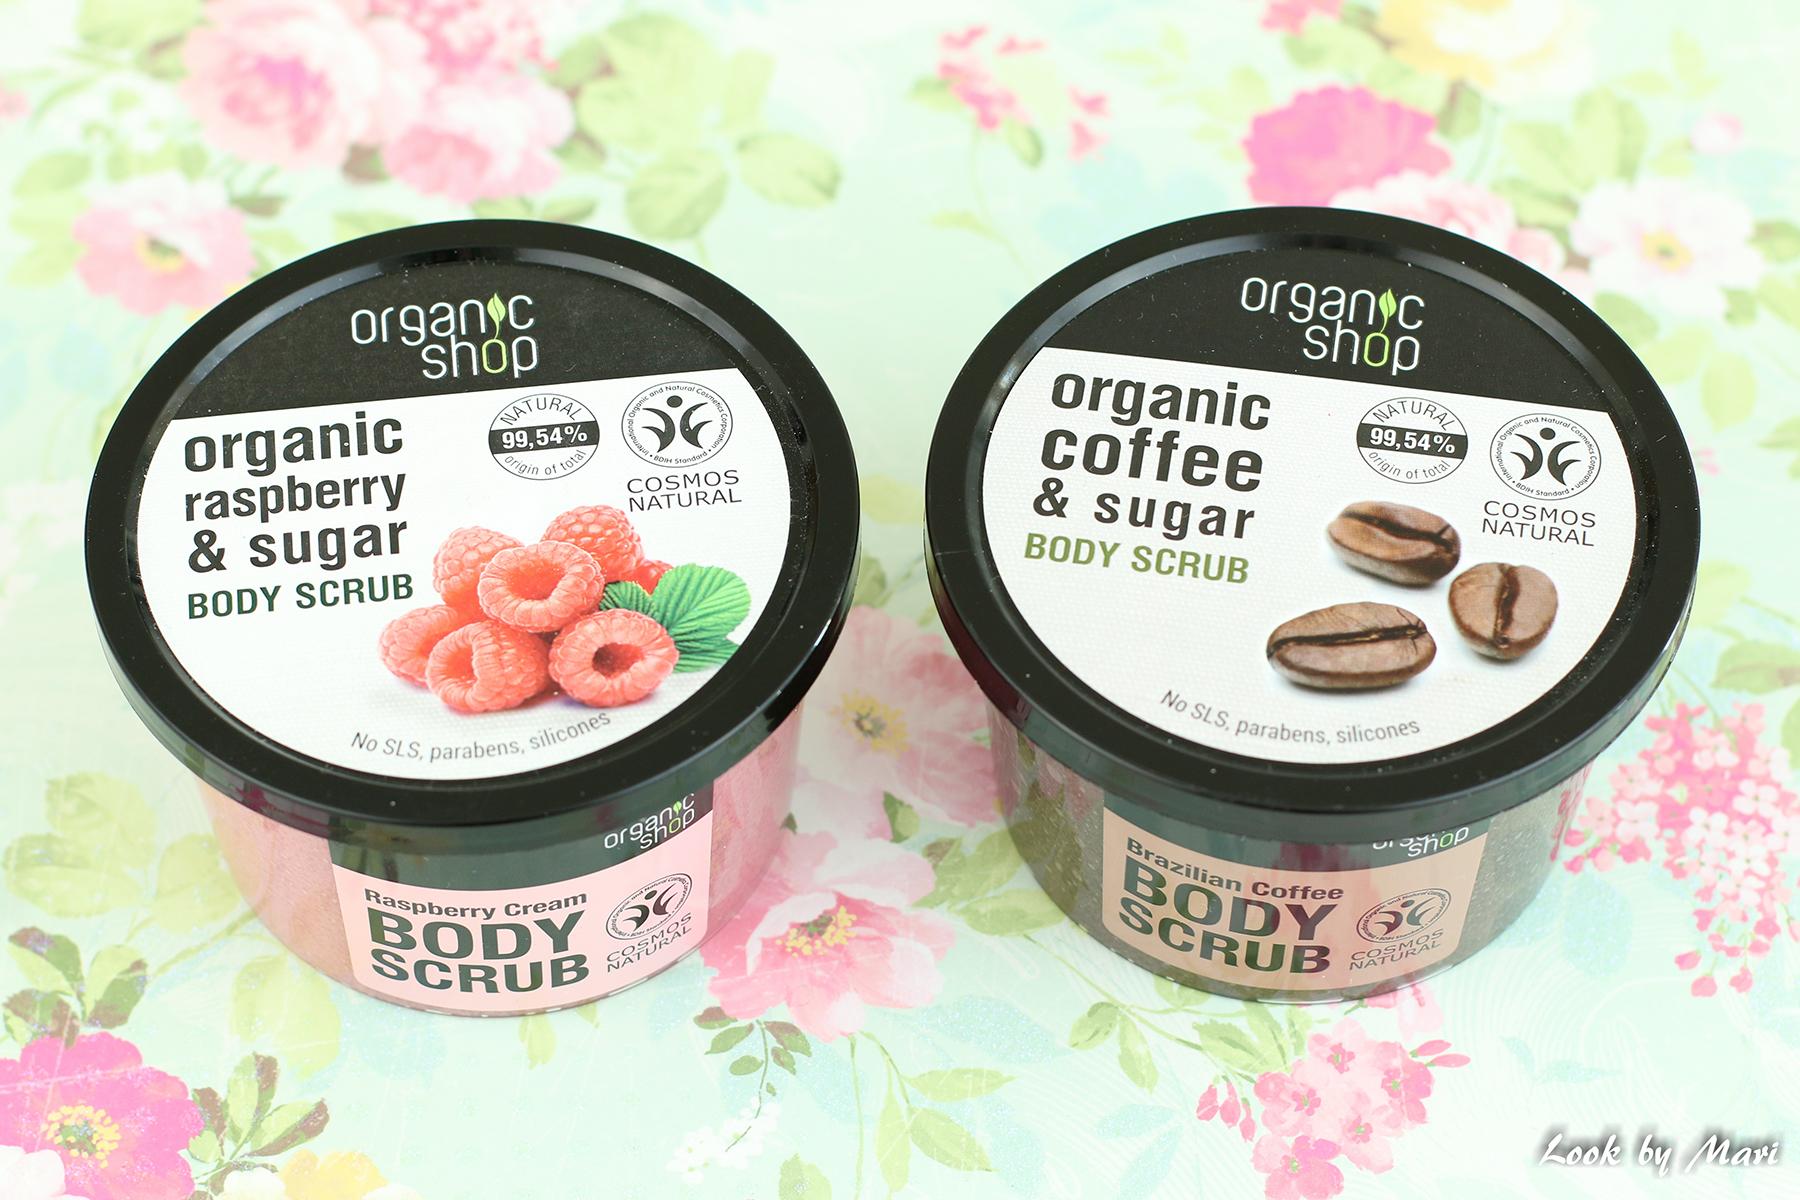 8 oganic shop body scrub kokemuksia coffee & sugar review raspberry & sugar sokos hinta tuoksu